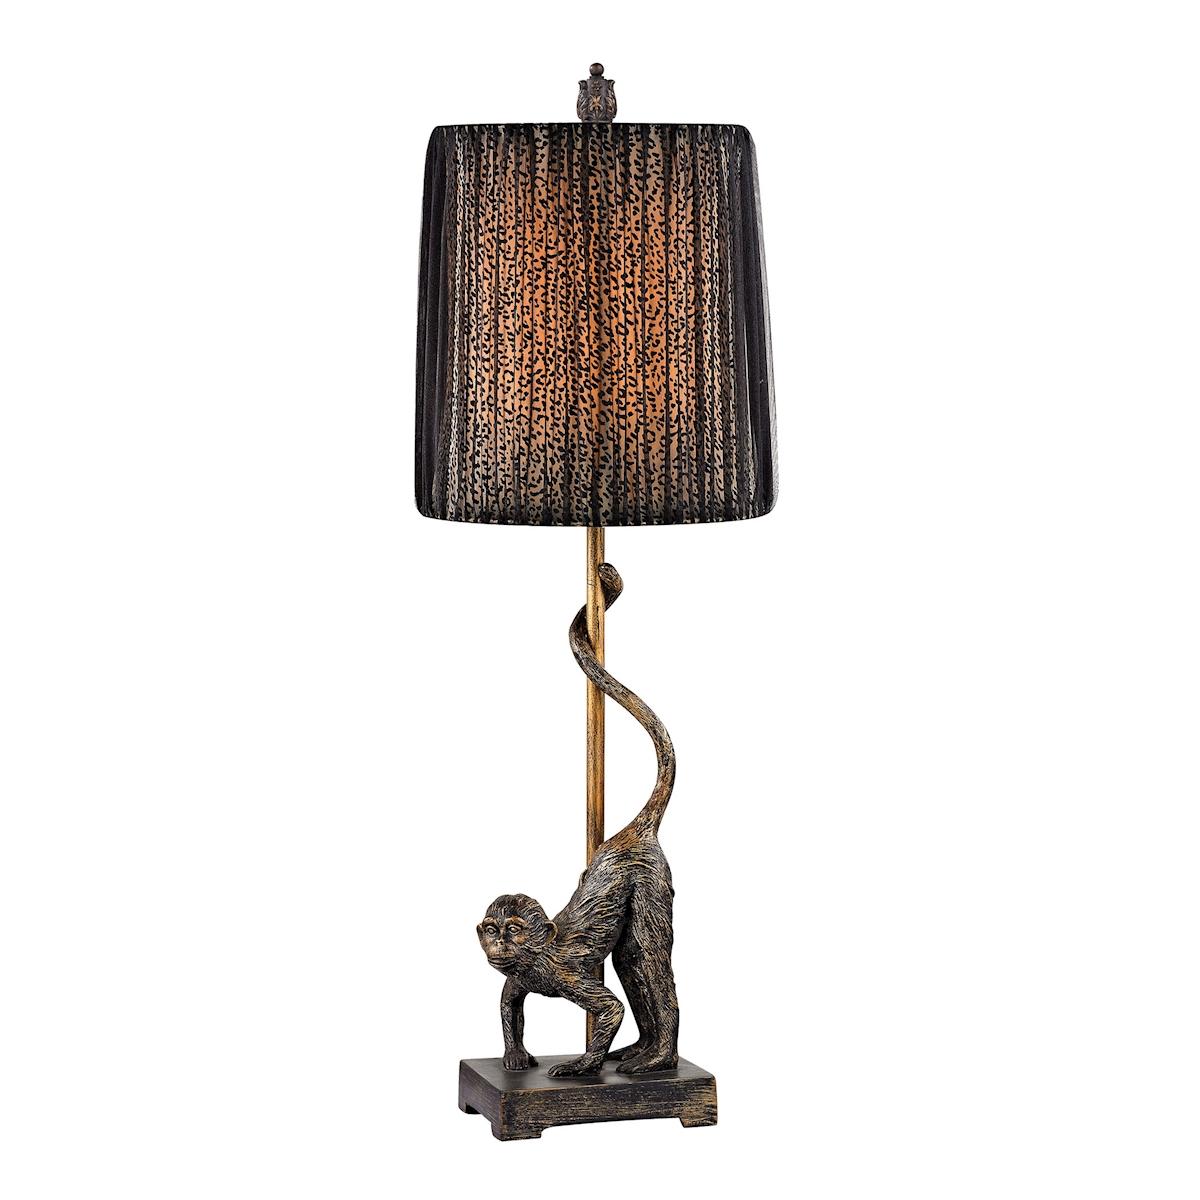 Dimond Aston 26 Monkey Table Lamp in Bronze